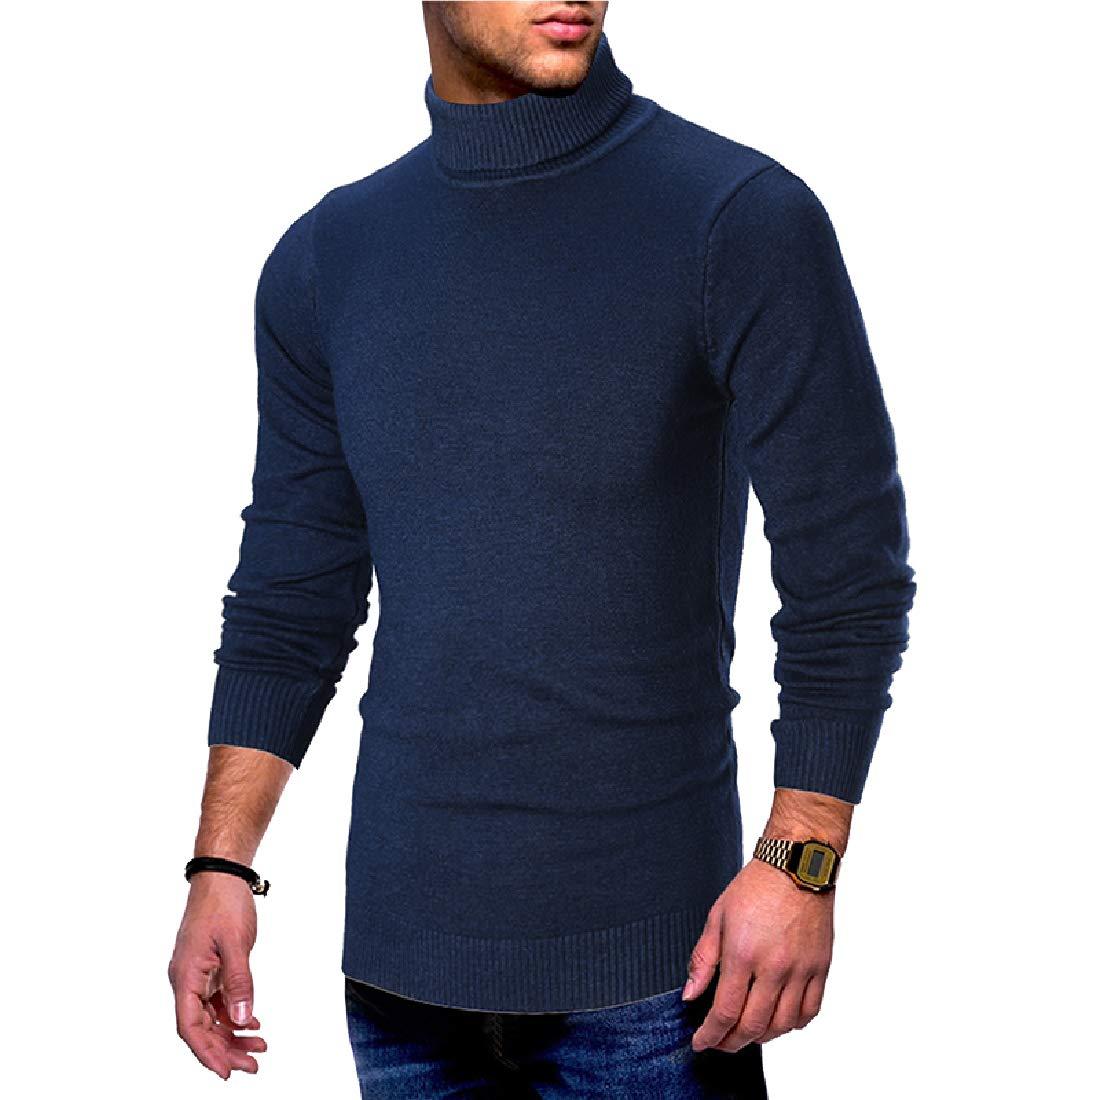 Coolred-Men Slim-Fit Knit Long-Sleeve Basic Turtleneck Pullovers Sweater